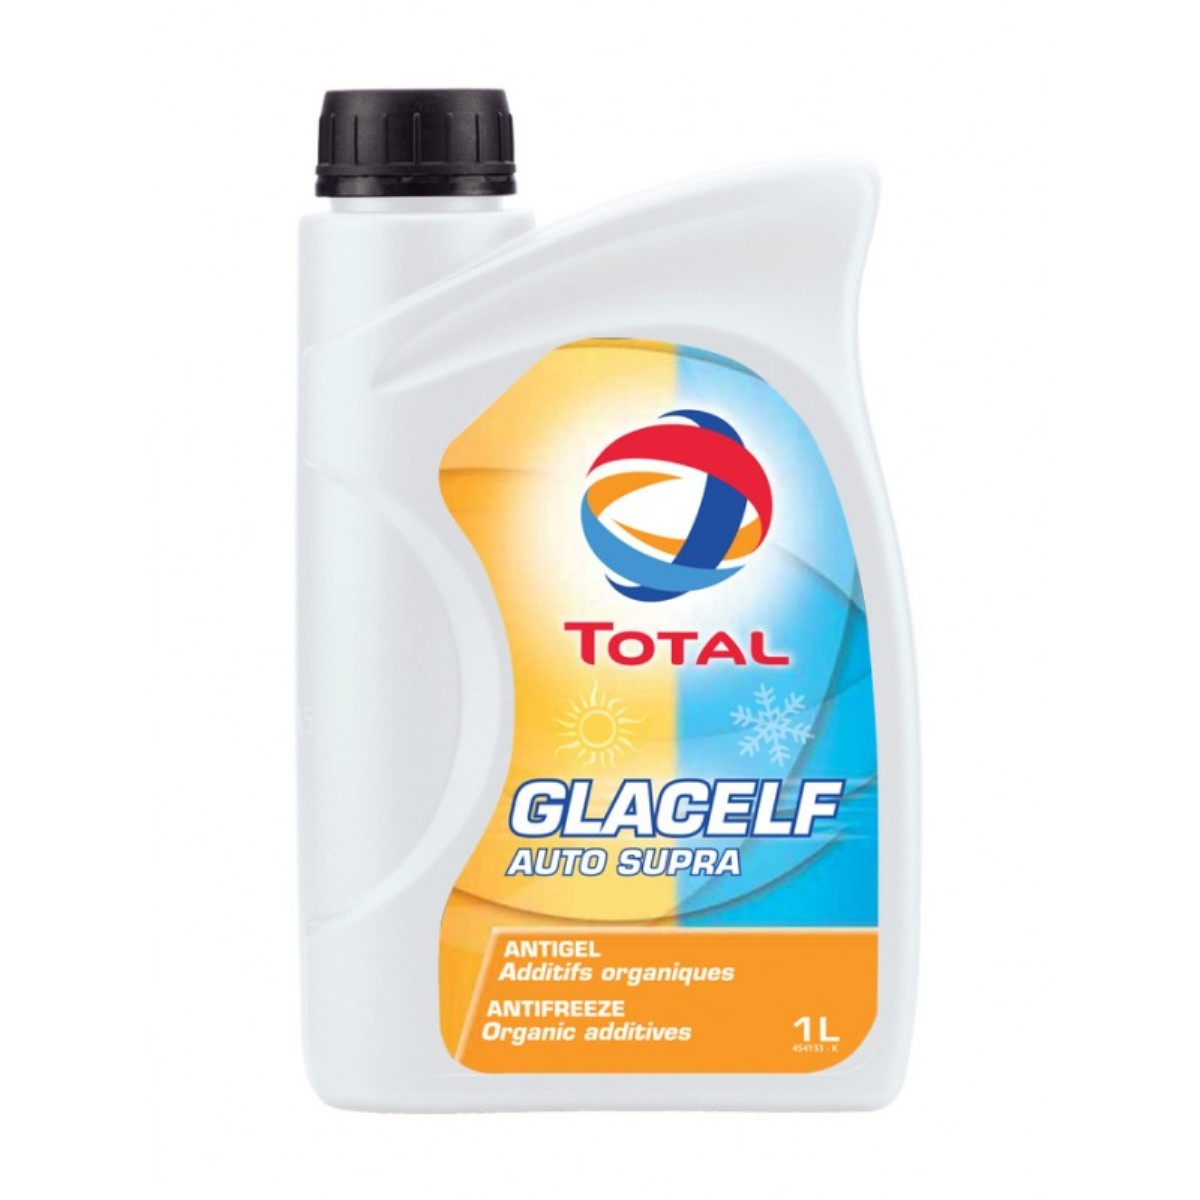 Антифриз Total Glacelf Auto Supra -38, цвет: оранжевый, 1 л антифриз тотал glacelf auto supra